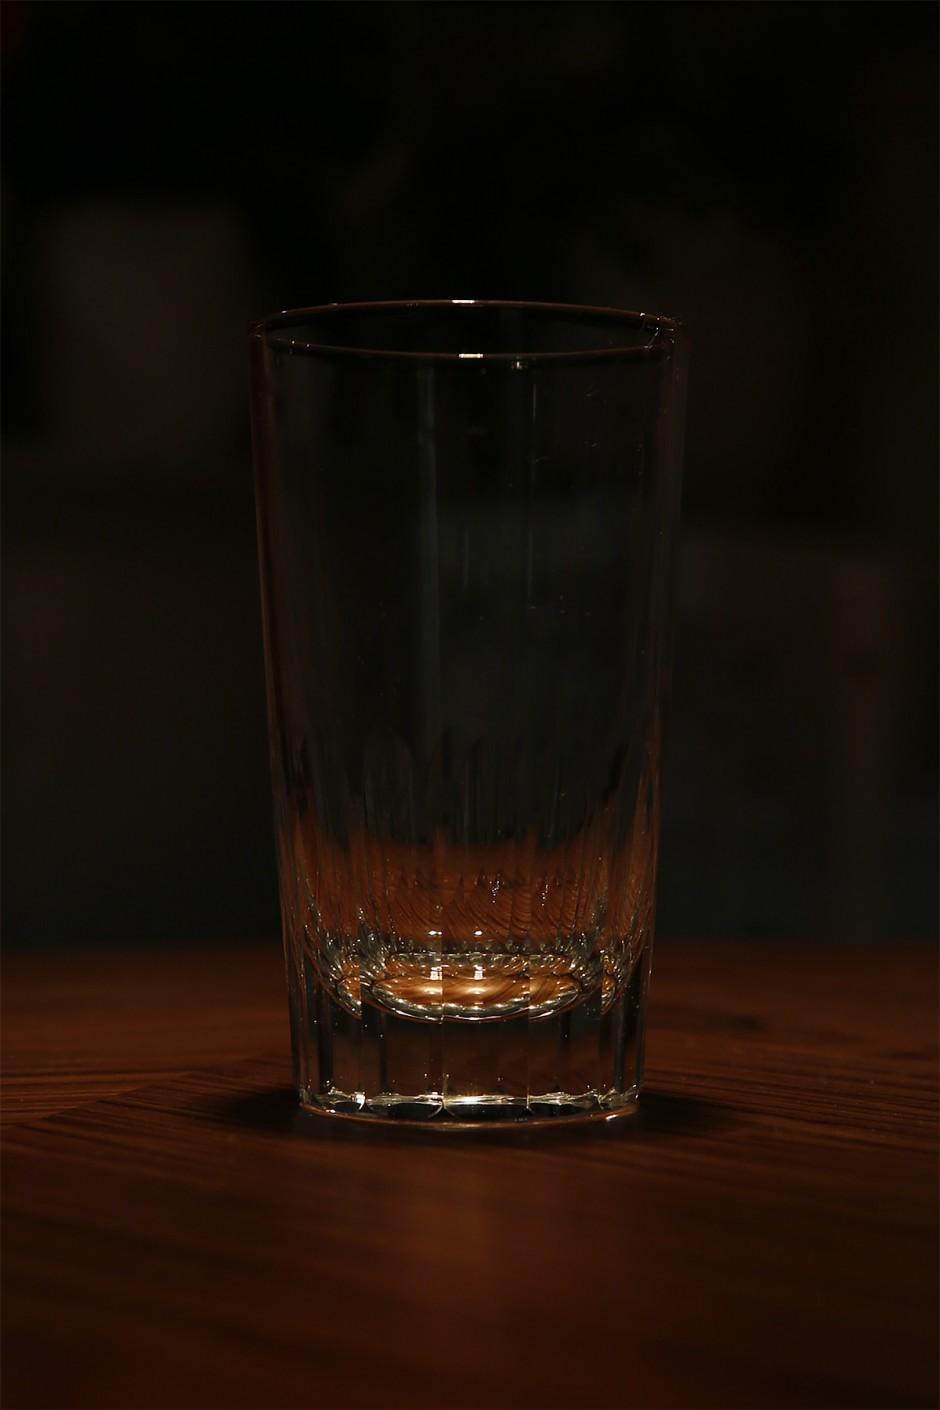 kristallglas-vattenglas